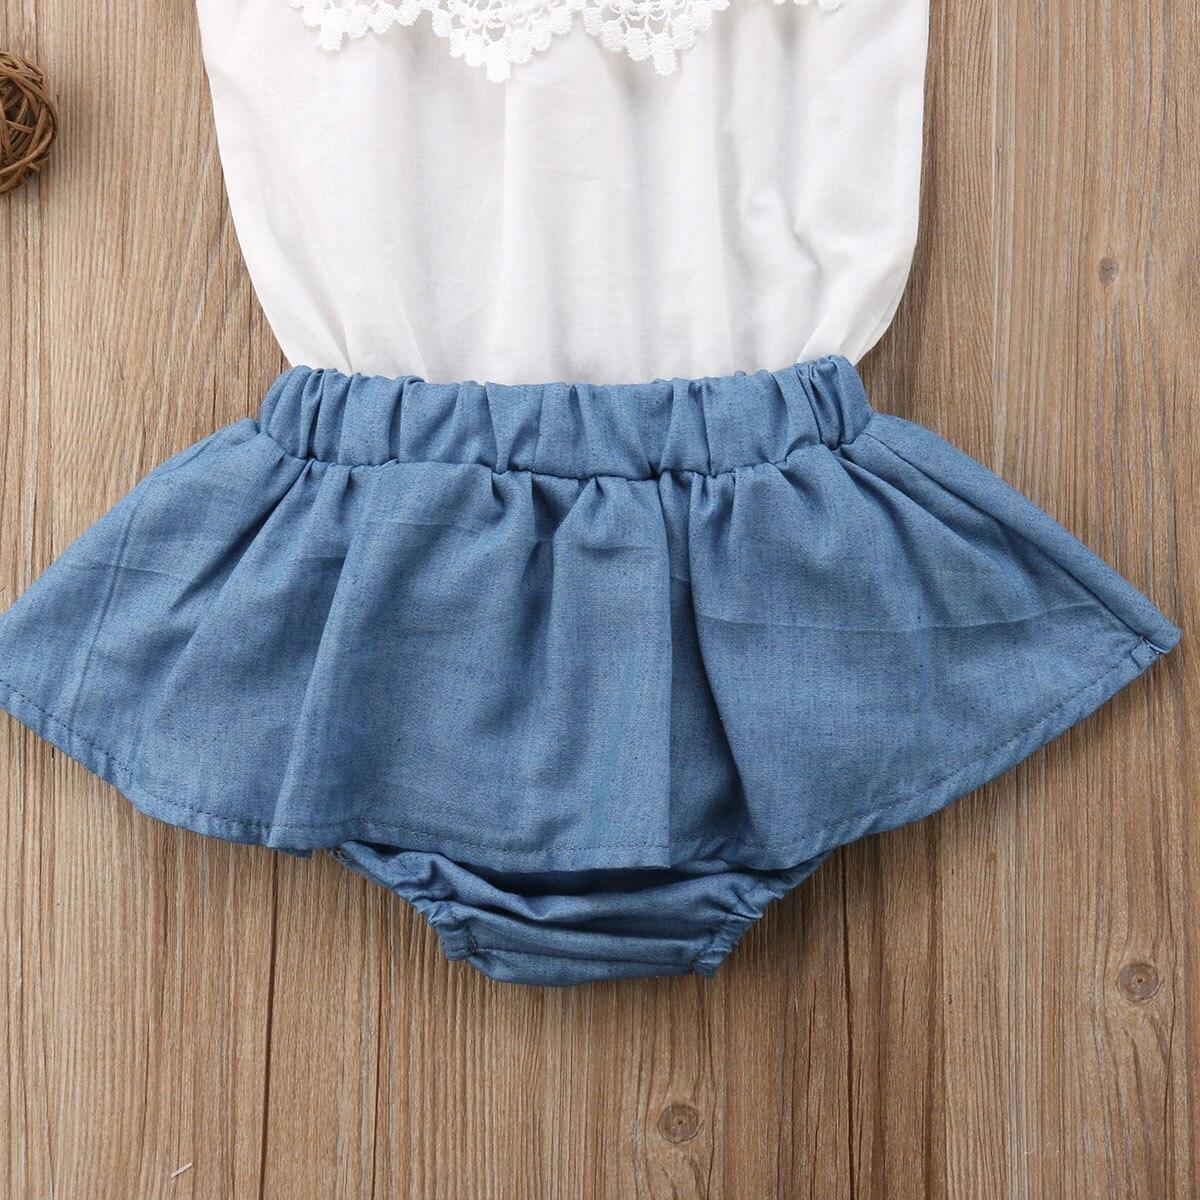 3Pcs Newborn Baby Girls Lace Top Shorts Dress T-shirt Denim Outfits Sunsuit